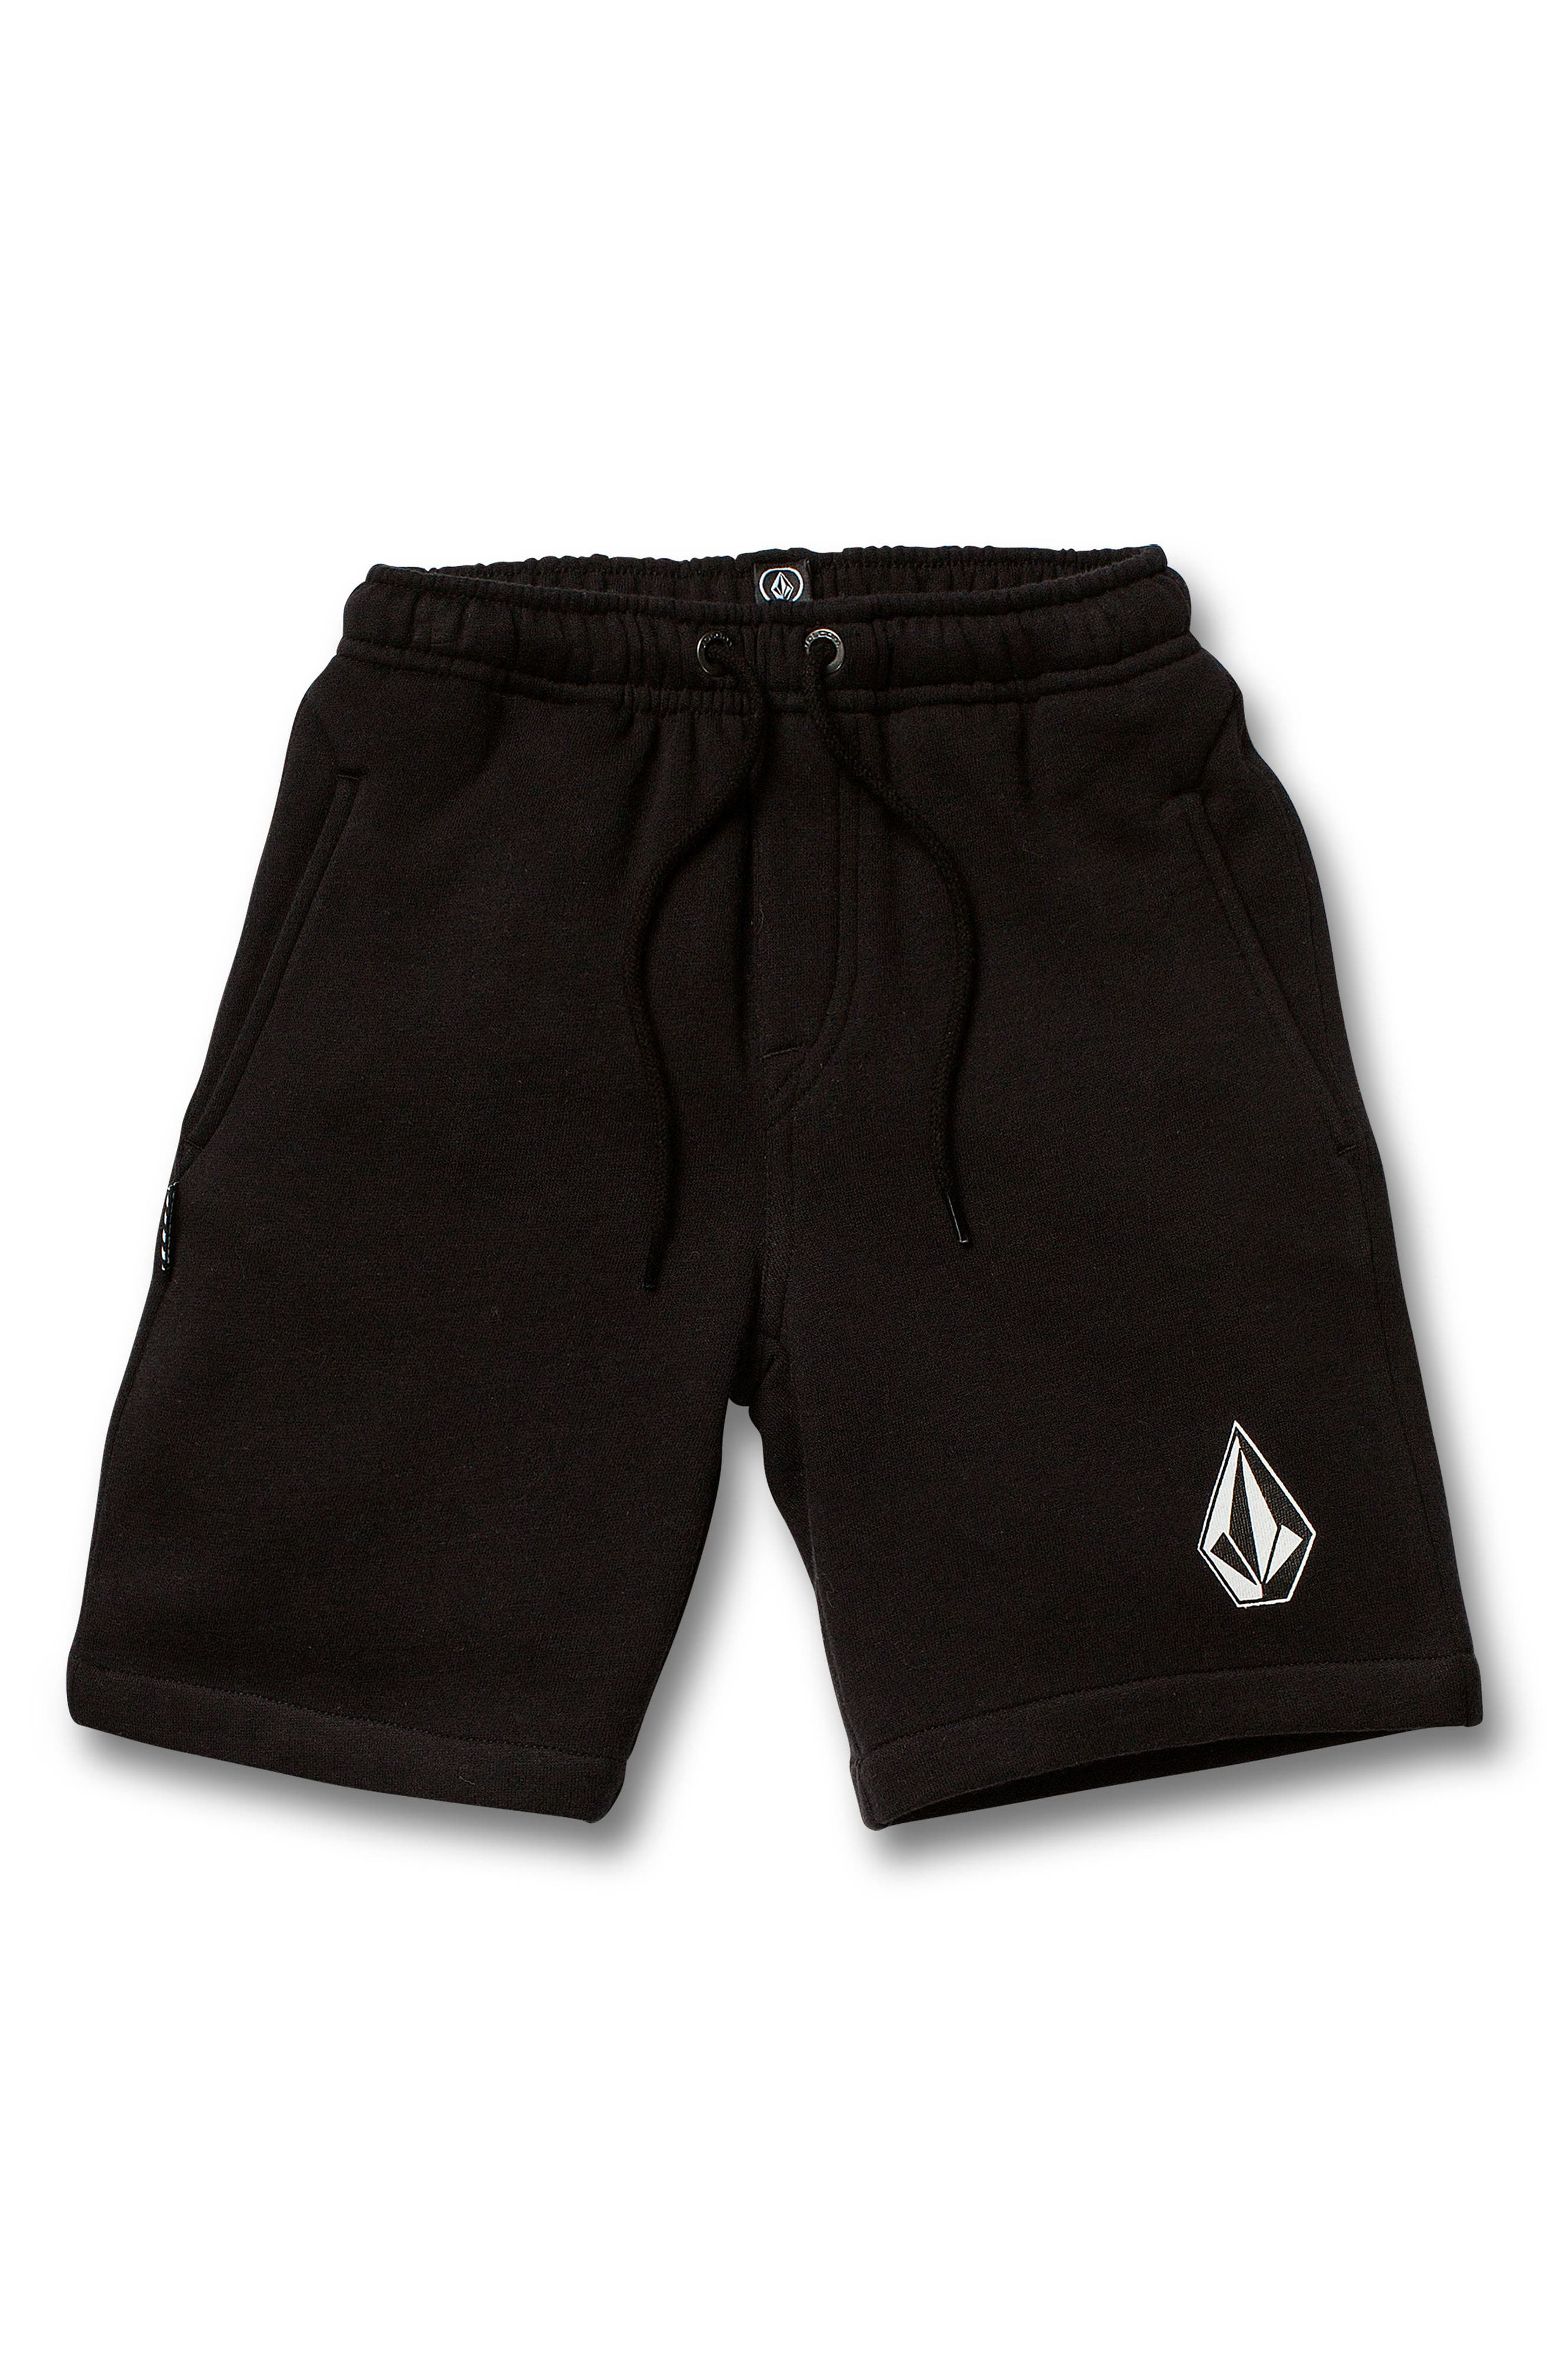 Boys Volcom Deadly Stones Fleece Shorts Size 7  Black